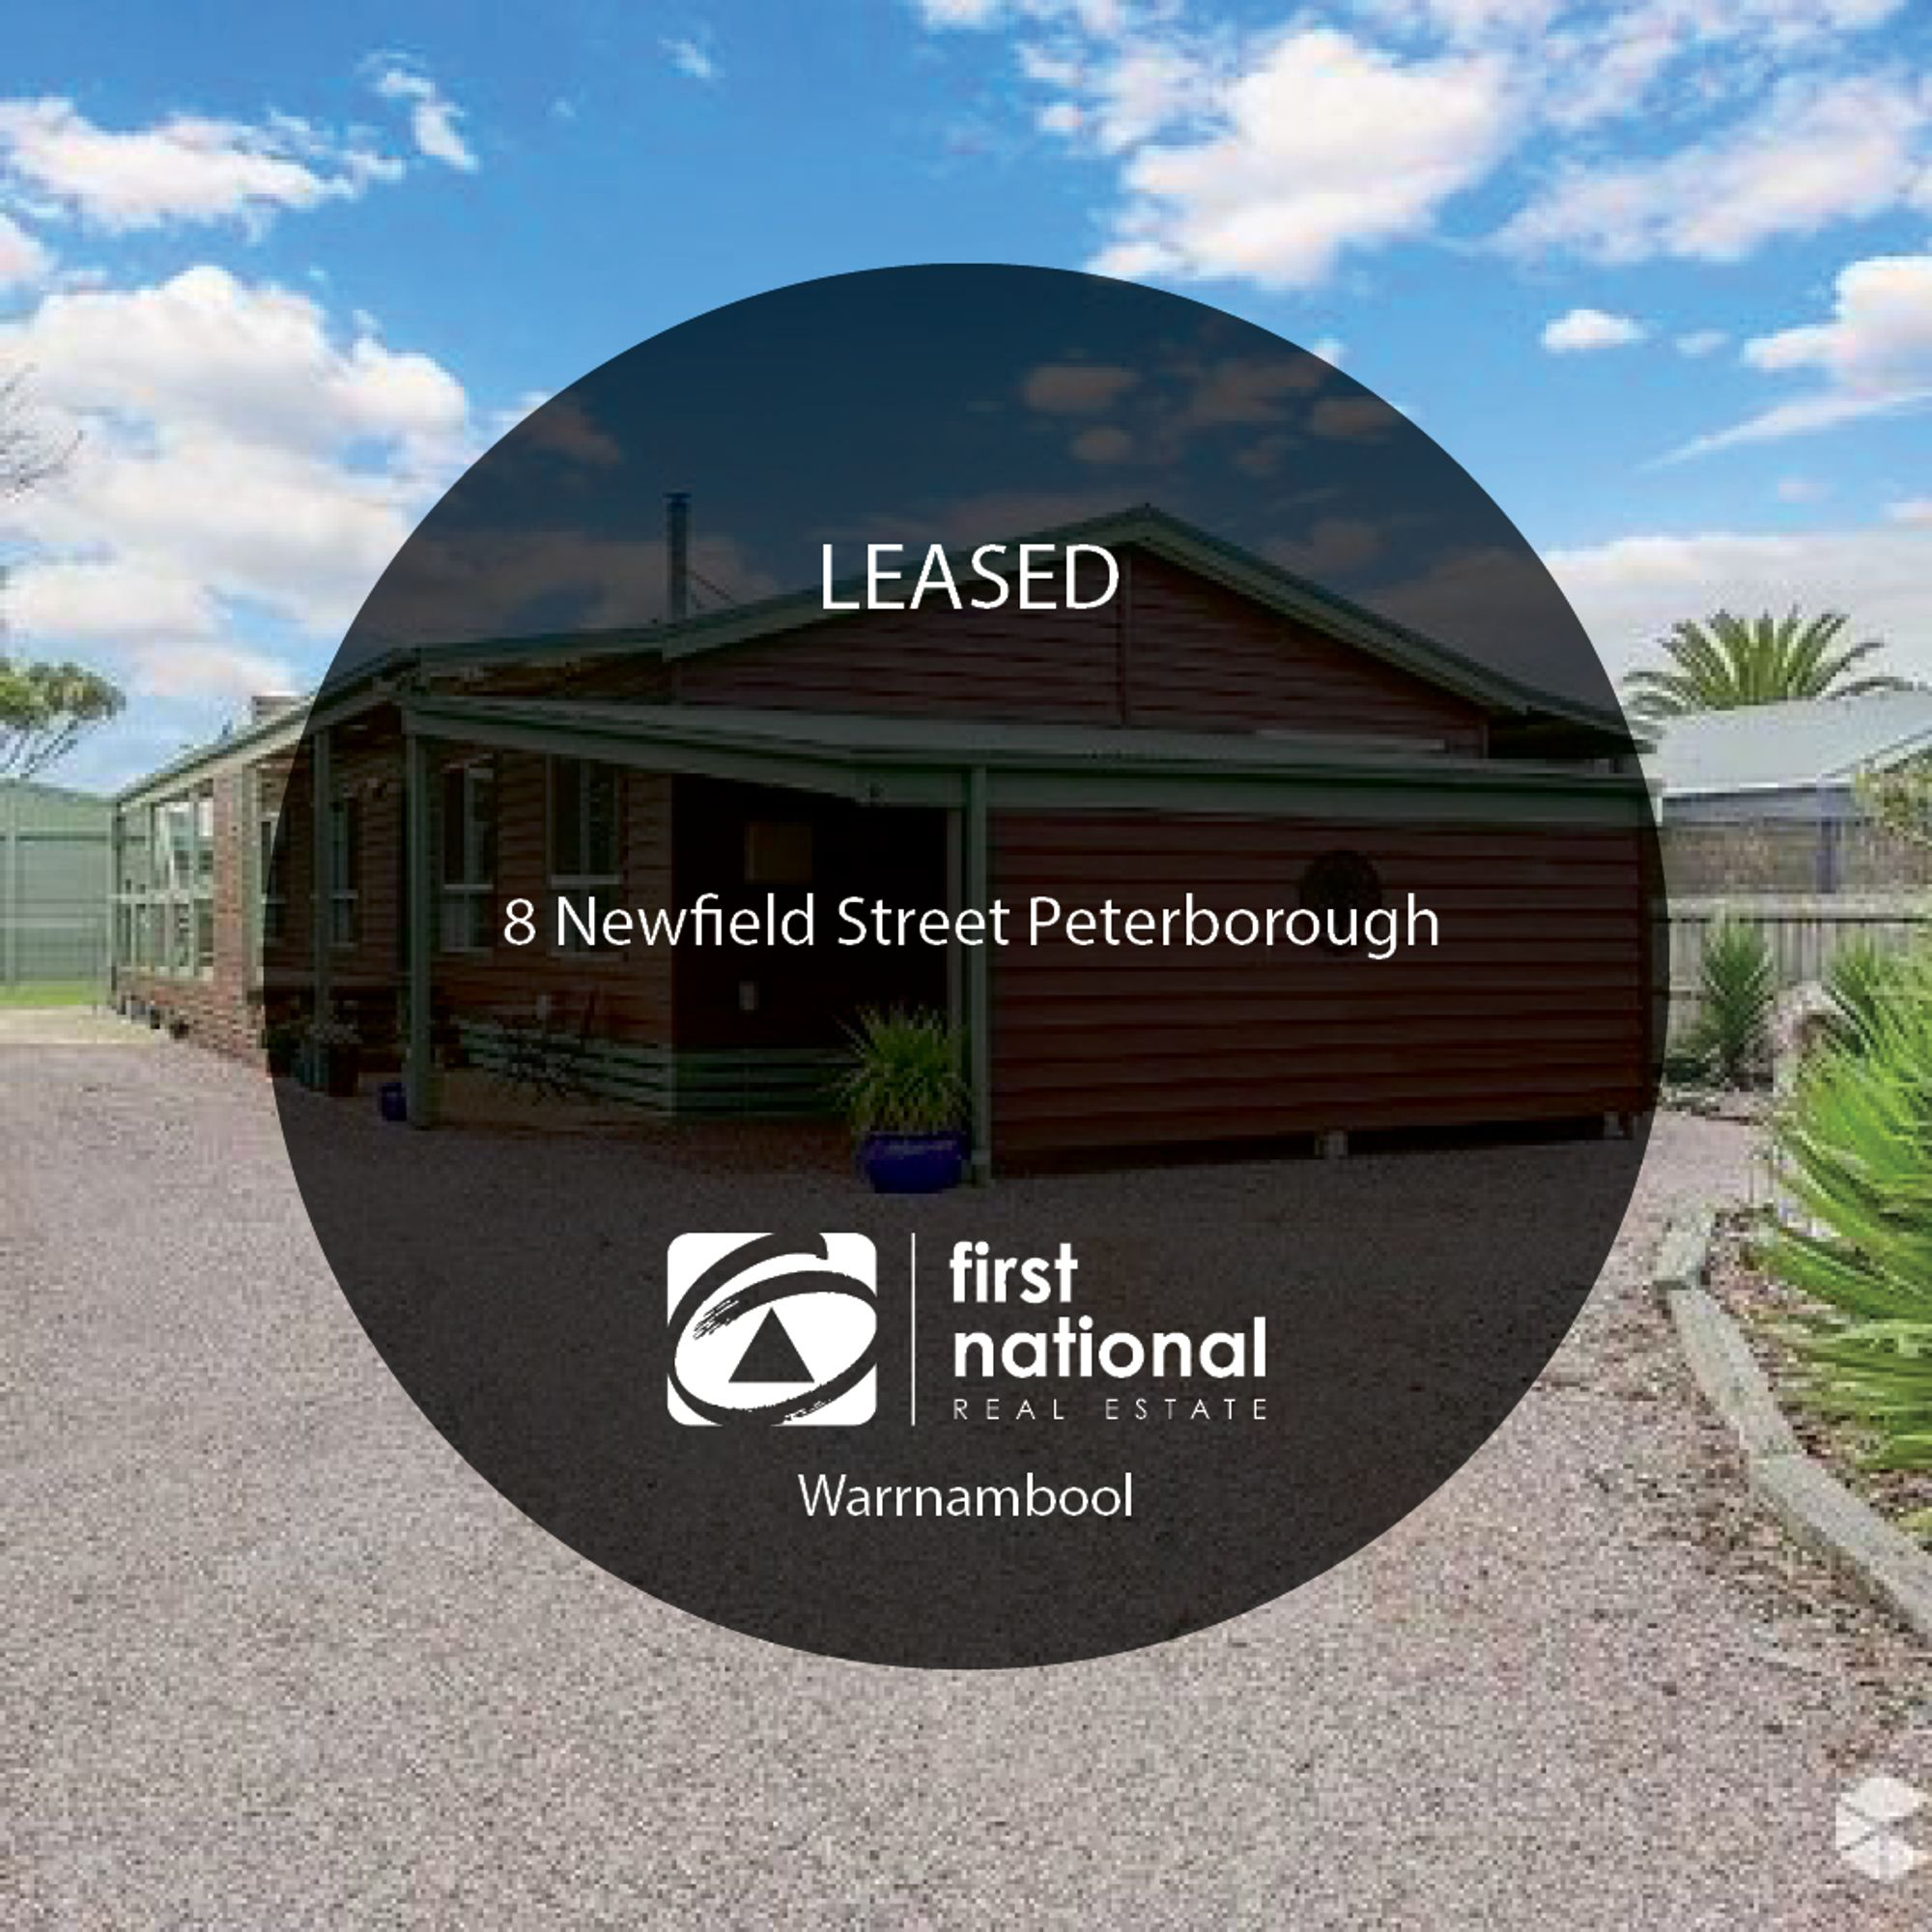 8 Newfield Street, Peterborough, VIC 3270